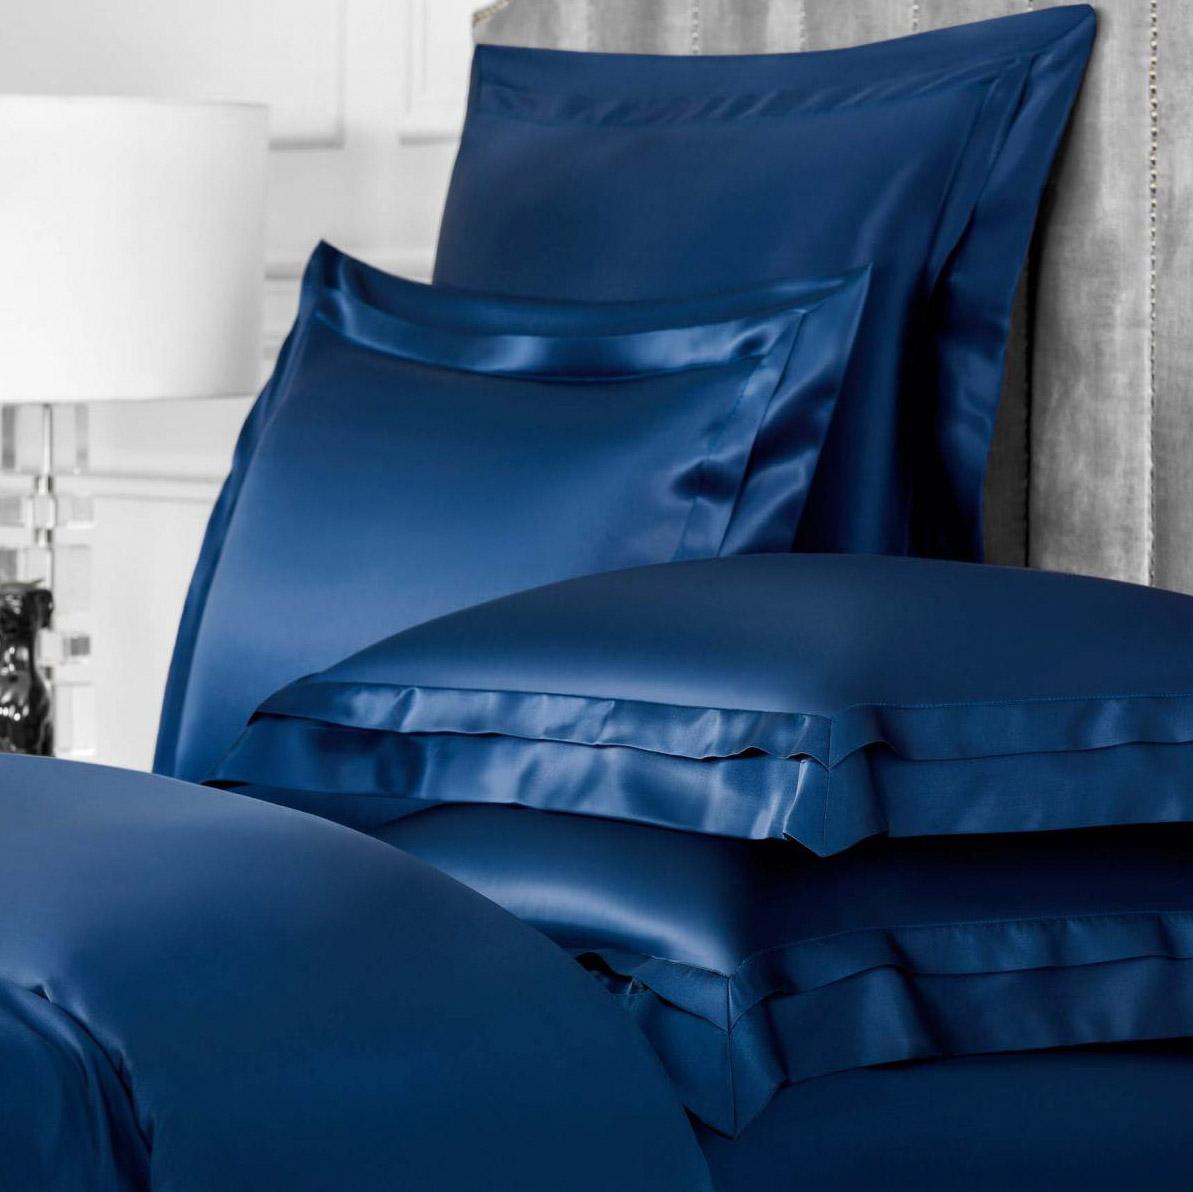 Комплект наволочек Togas Элит темно-синий 50х70. 2 пр